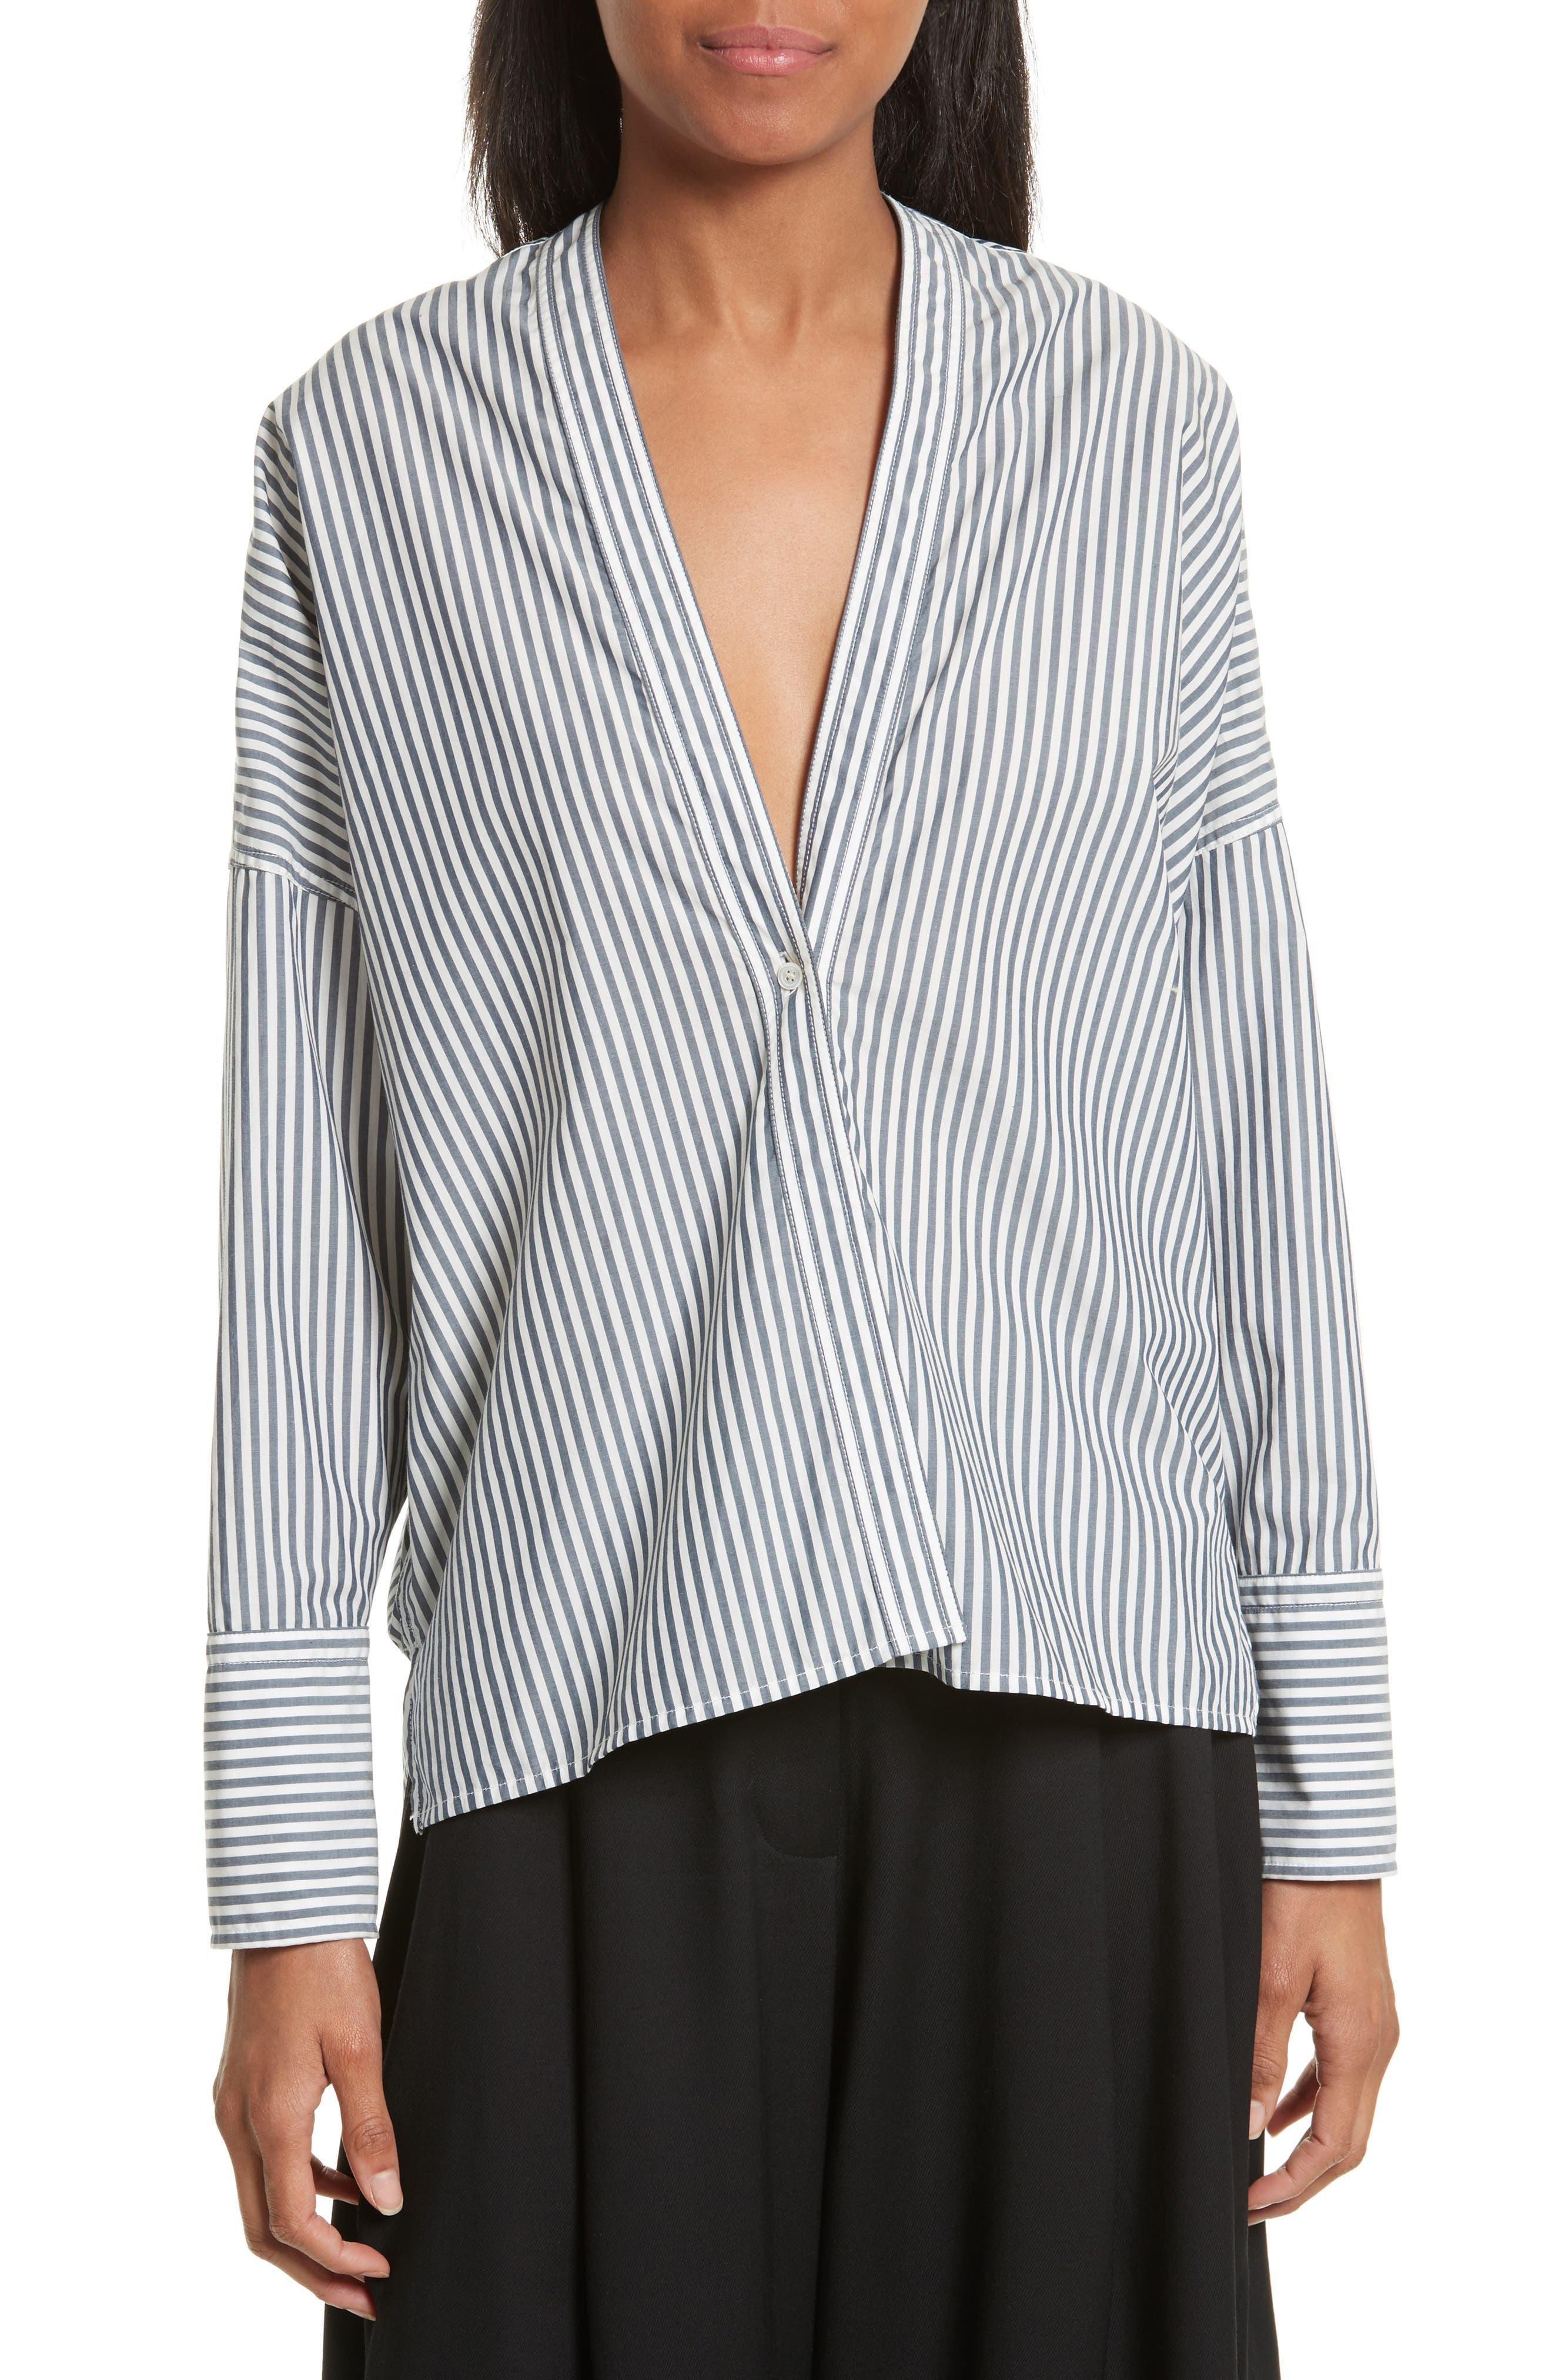 Main Image - Nili Lotan Sabine Stripe Cotton Top